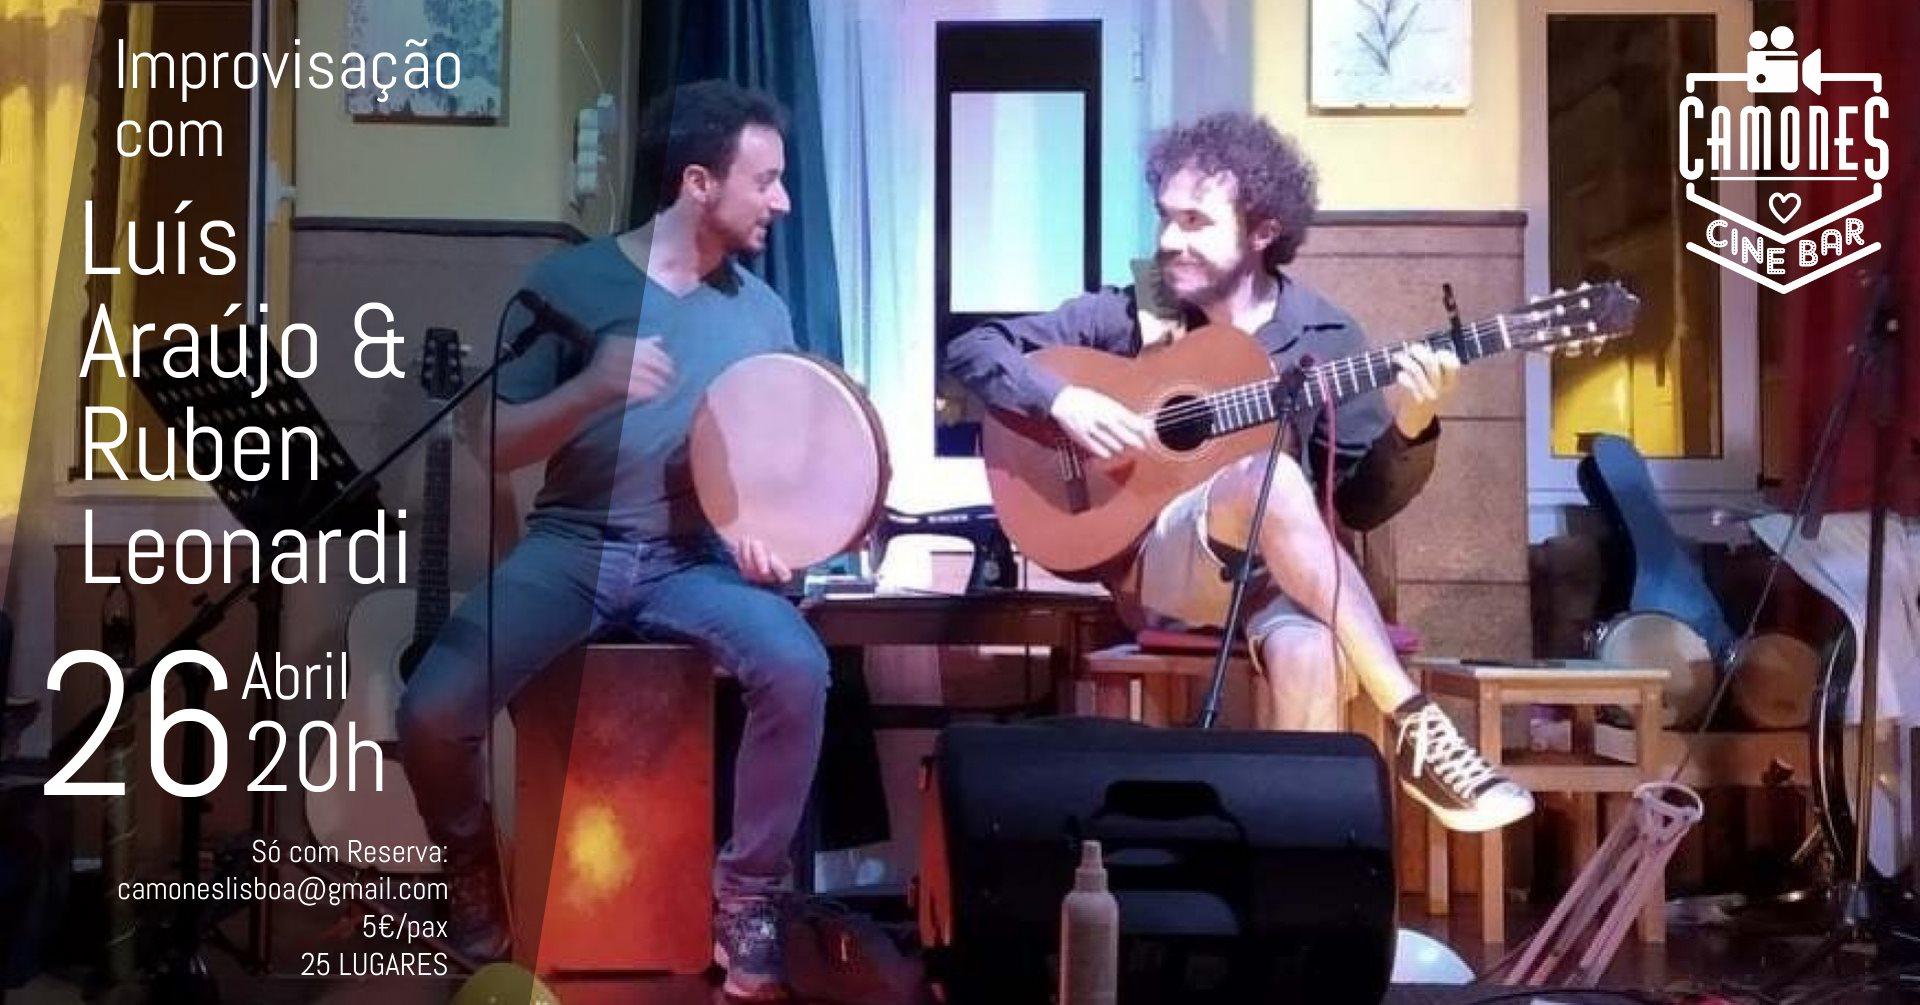 Improvisação: Luís Araújo & Ruben Leonardi